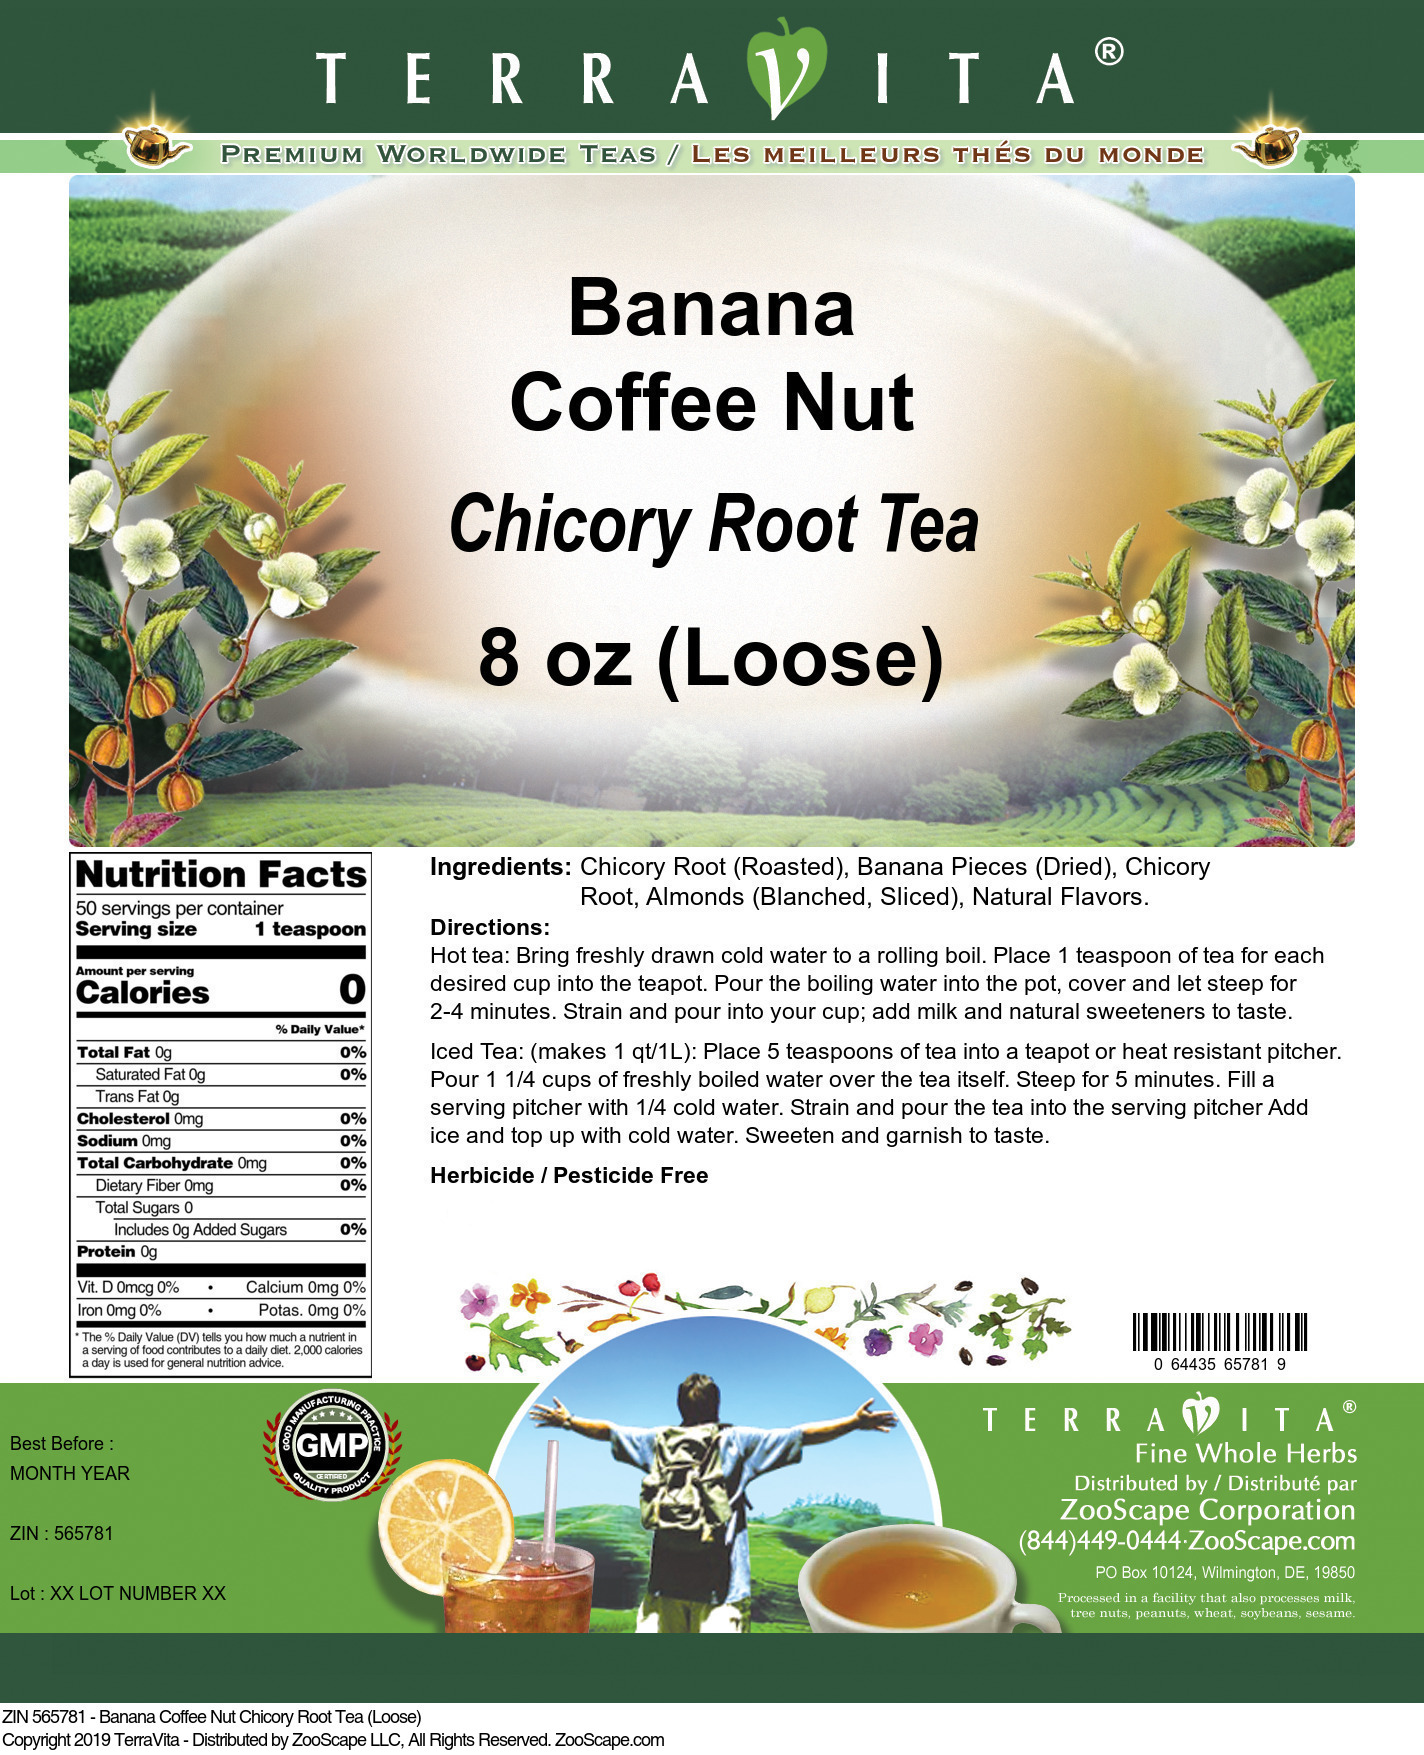 Banana Coffee Nut Chicory Root